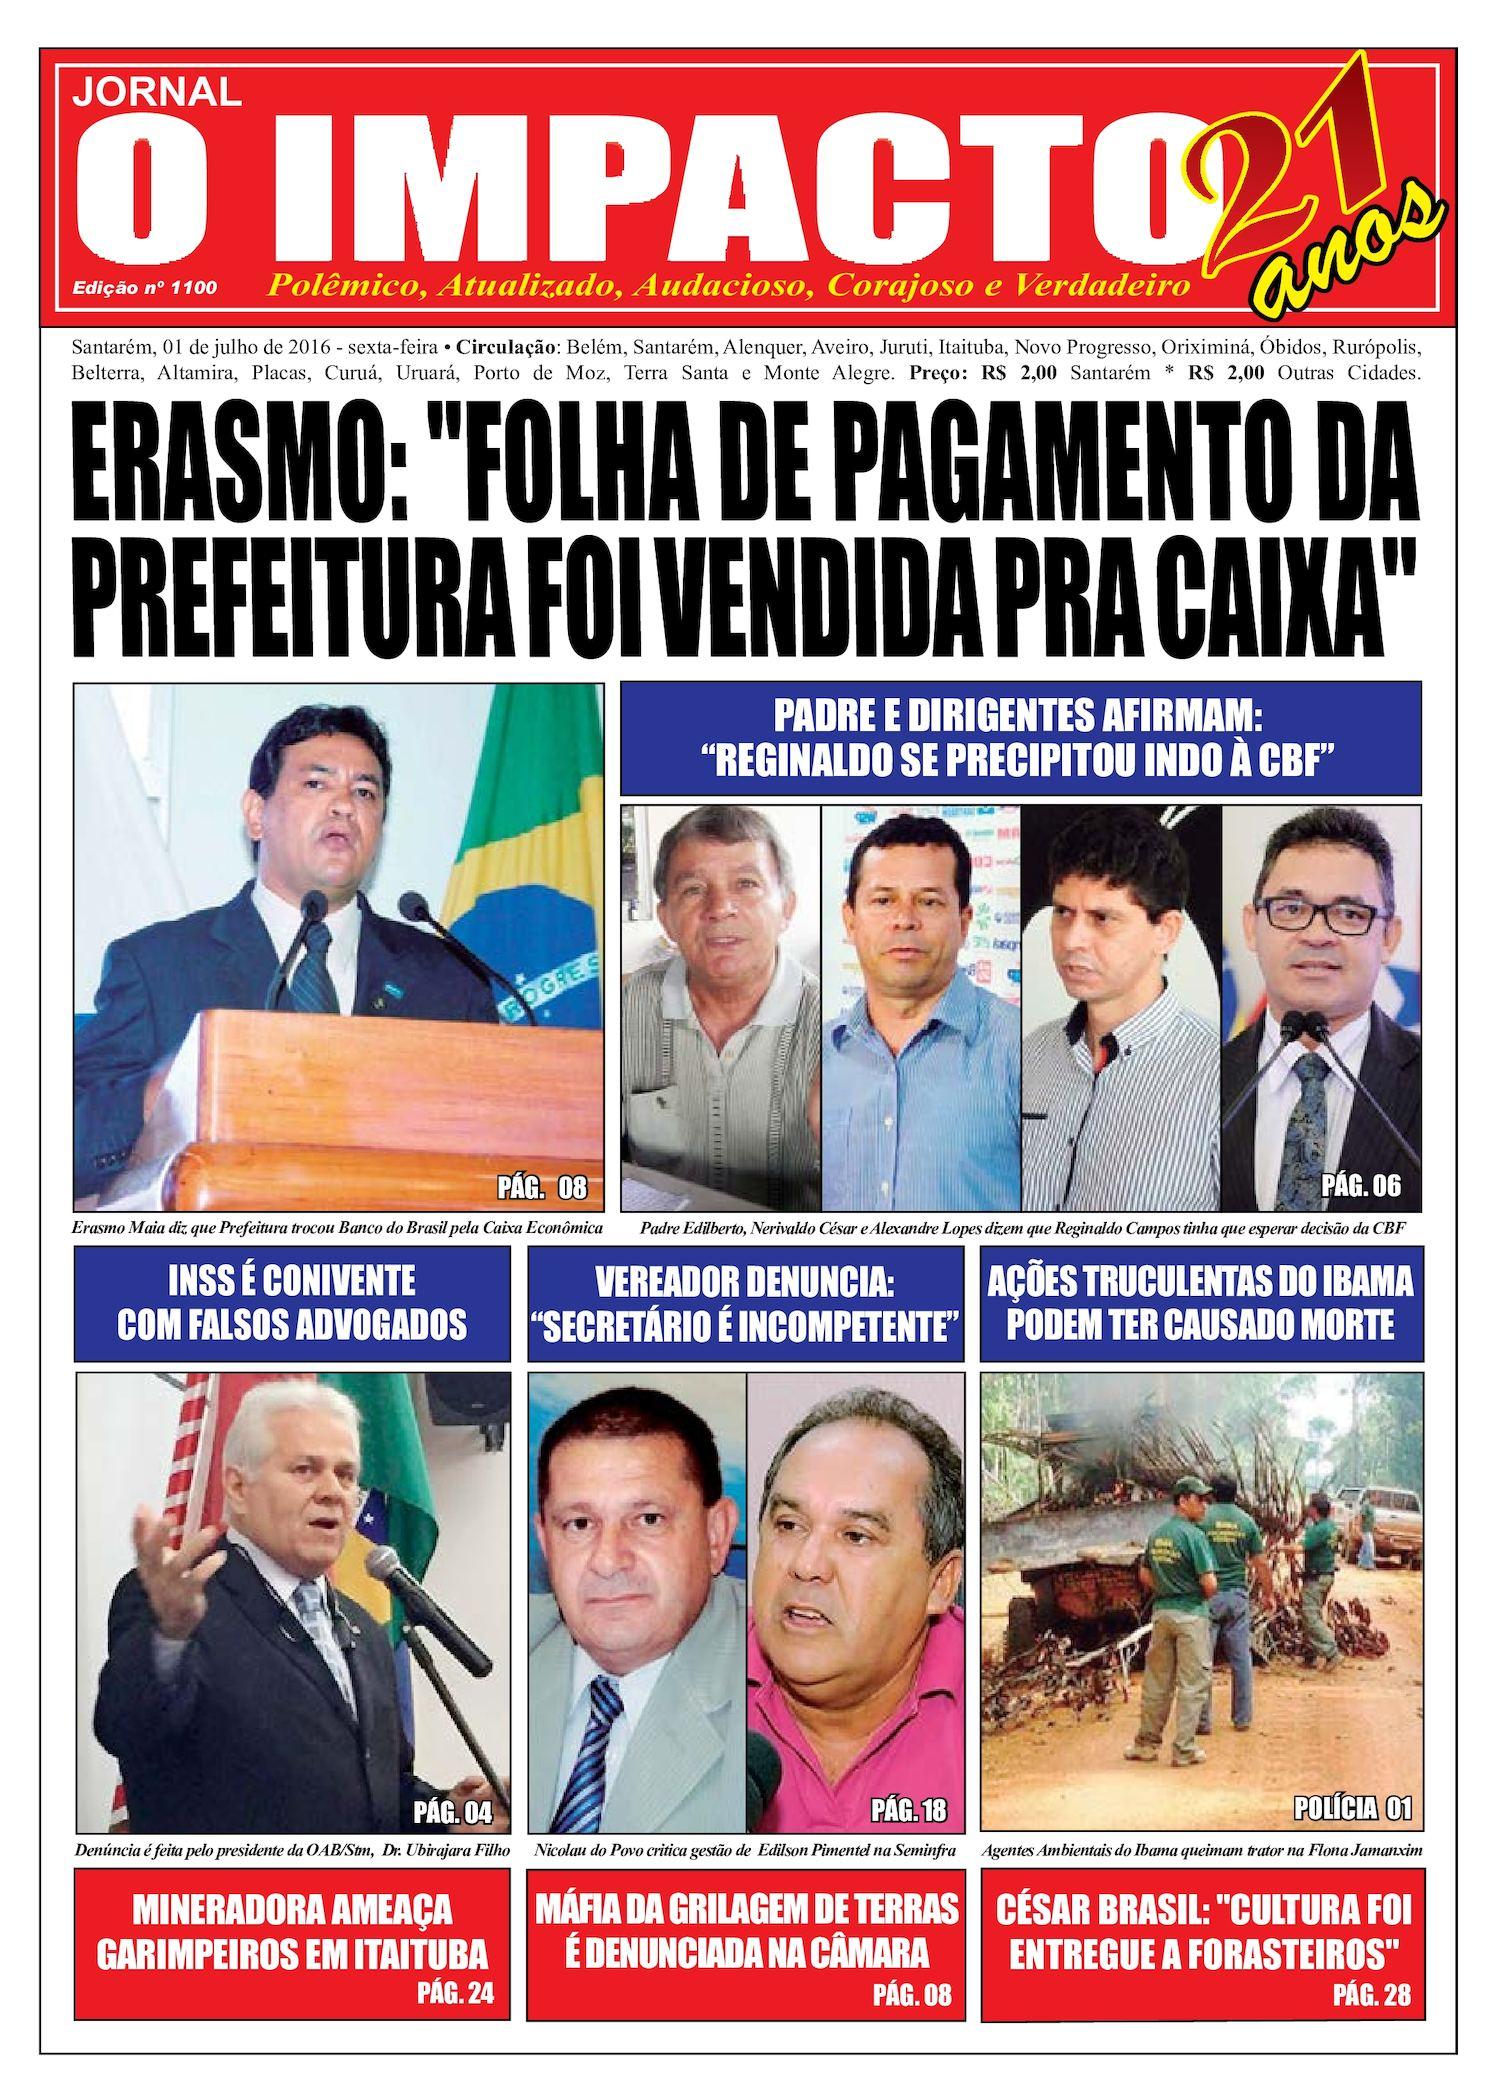 7a85252bdb1b6 Calaméo - Jornal O Impacto Ed. 1100